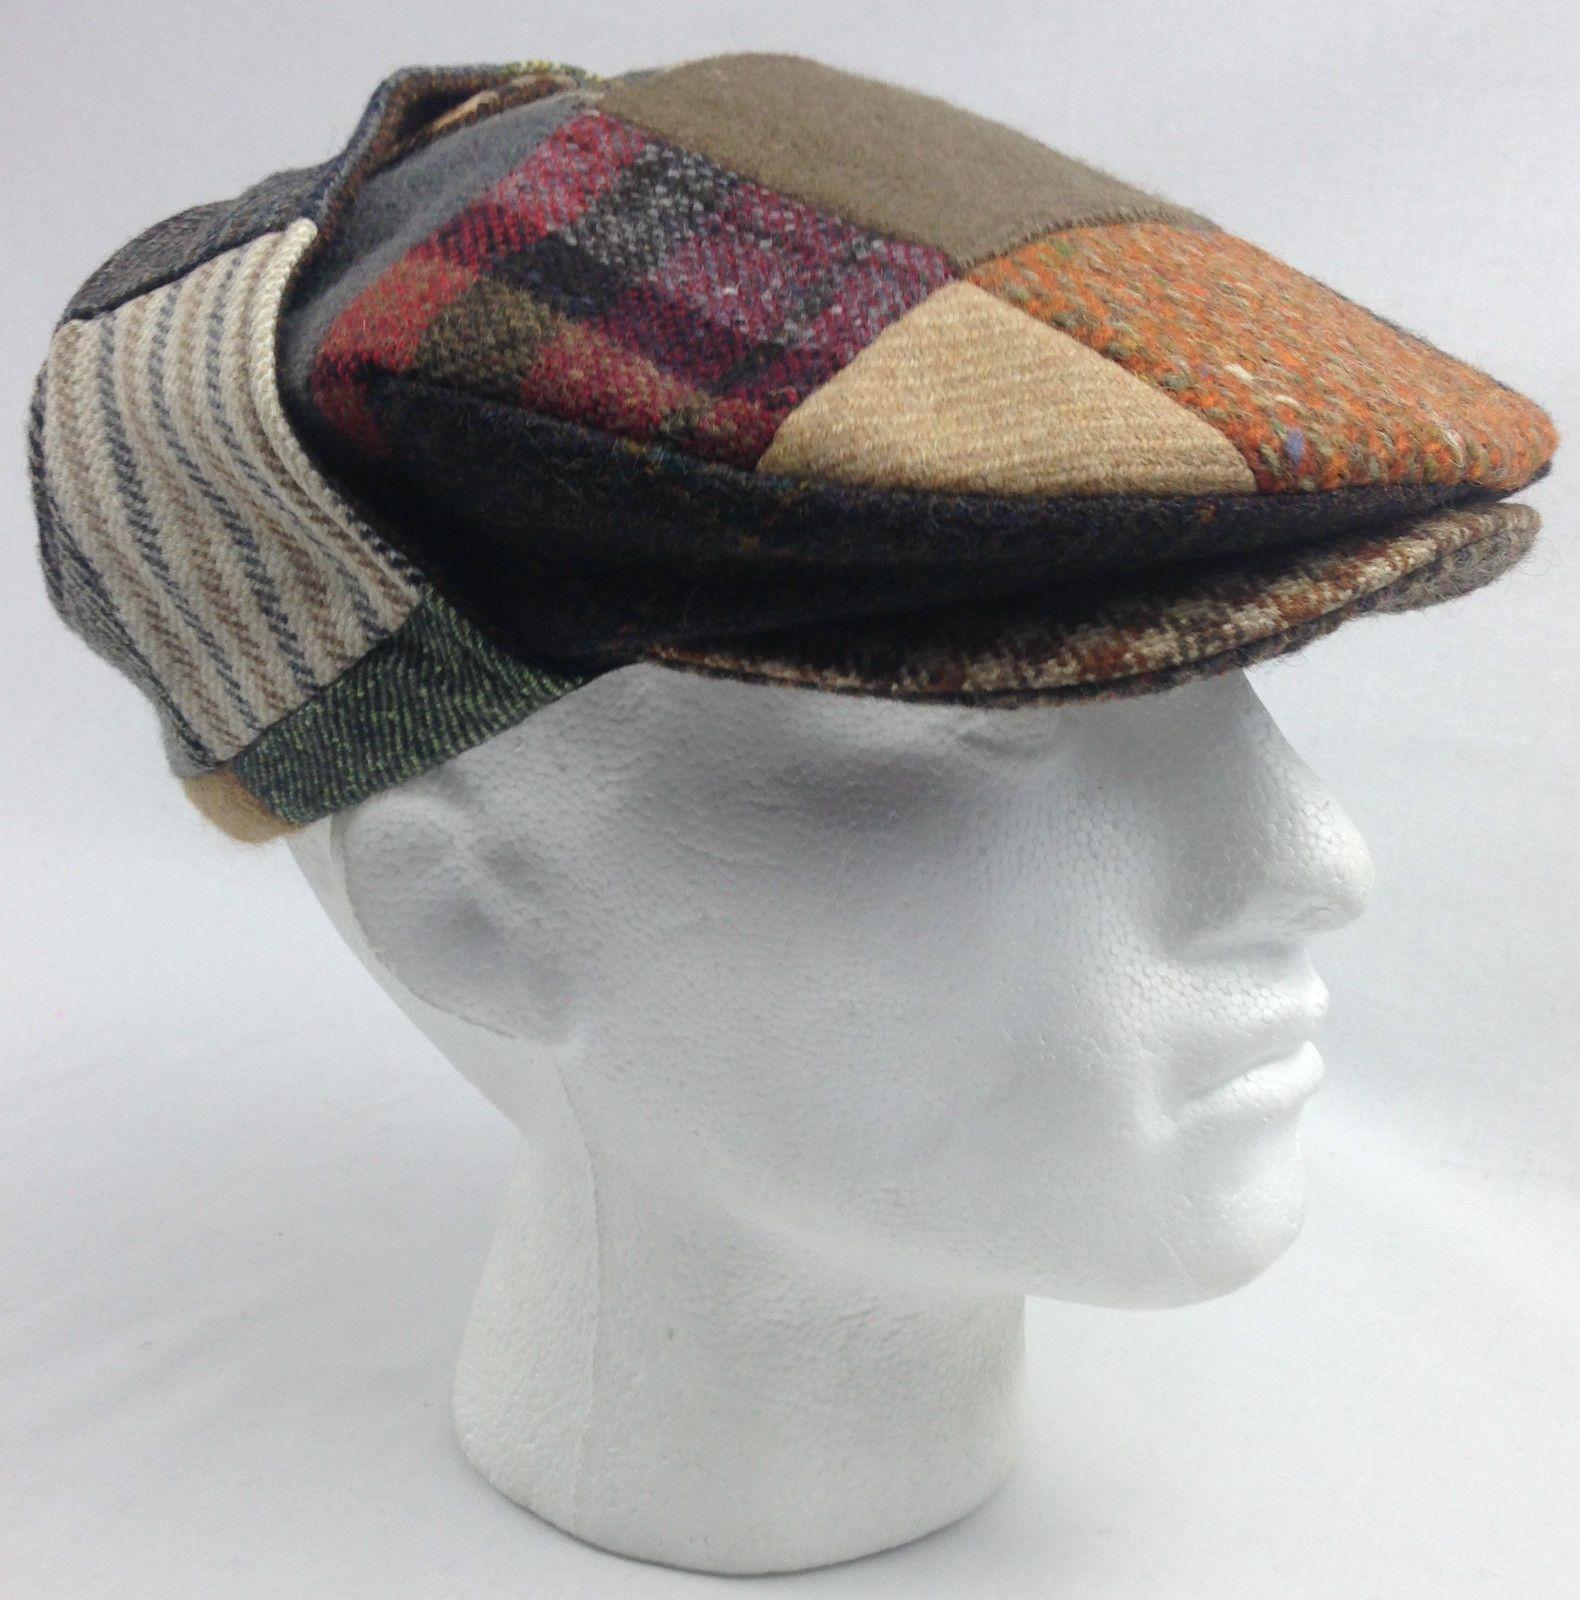 HANNA HATS Patch Tweed Lugg Hat Flat Cap Wool Handmade in IRELAND Mens Ear  Flap  469b73c6880